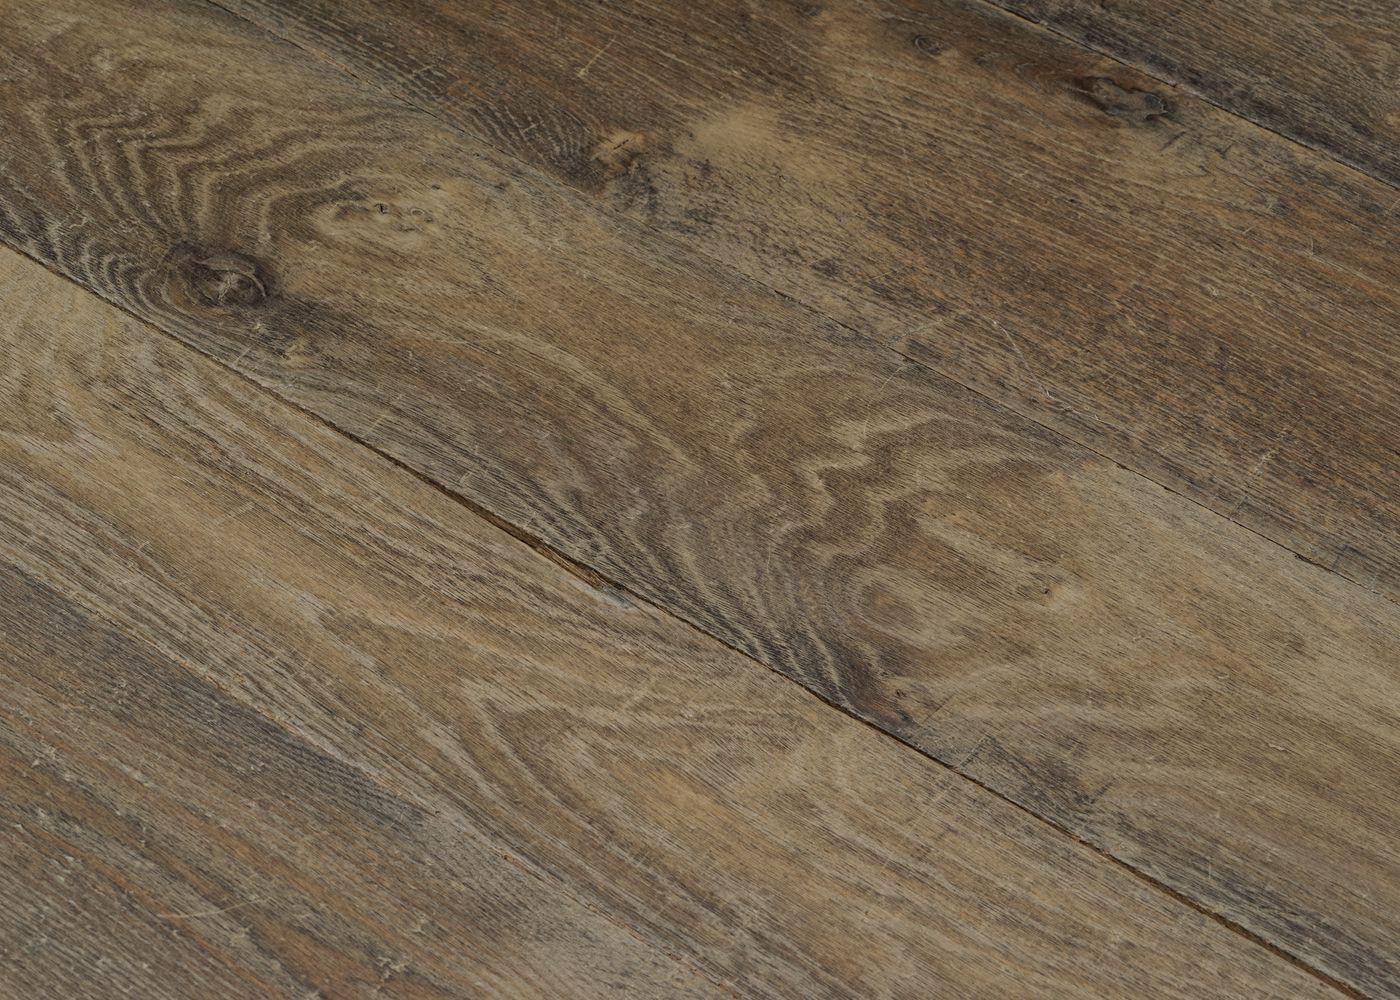 Parquet chêne massif NEWPORT vieilli huile aqua 15x120-200x1800-2700